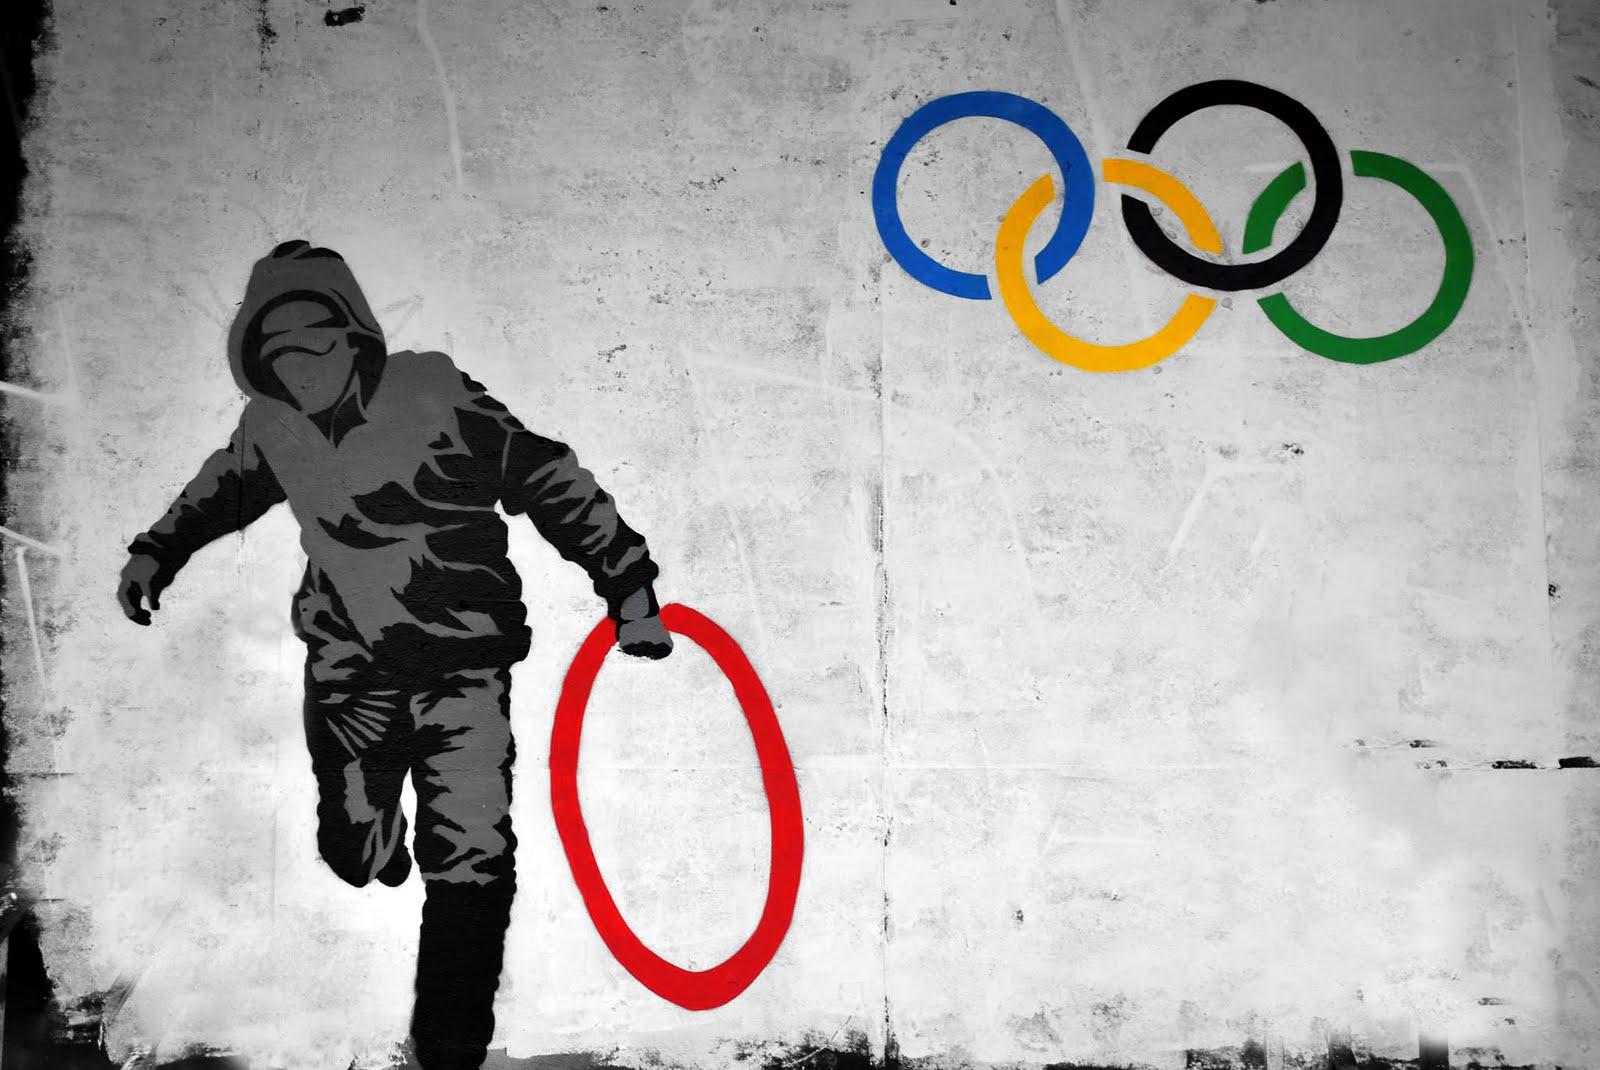 Olympic Rings アート バンクシーbanksy Pcデスクトップ壁紙 画像